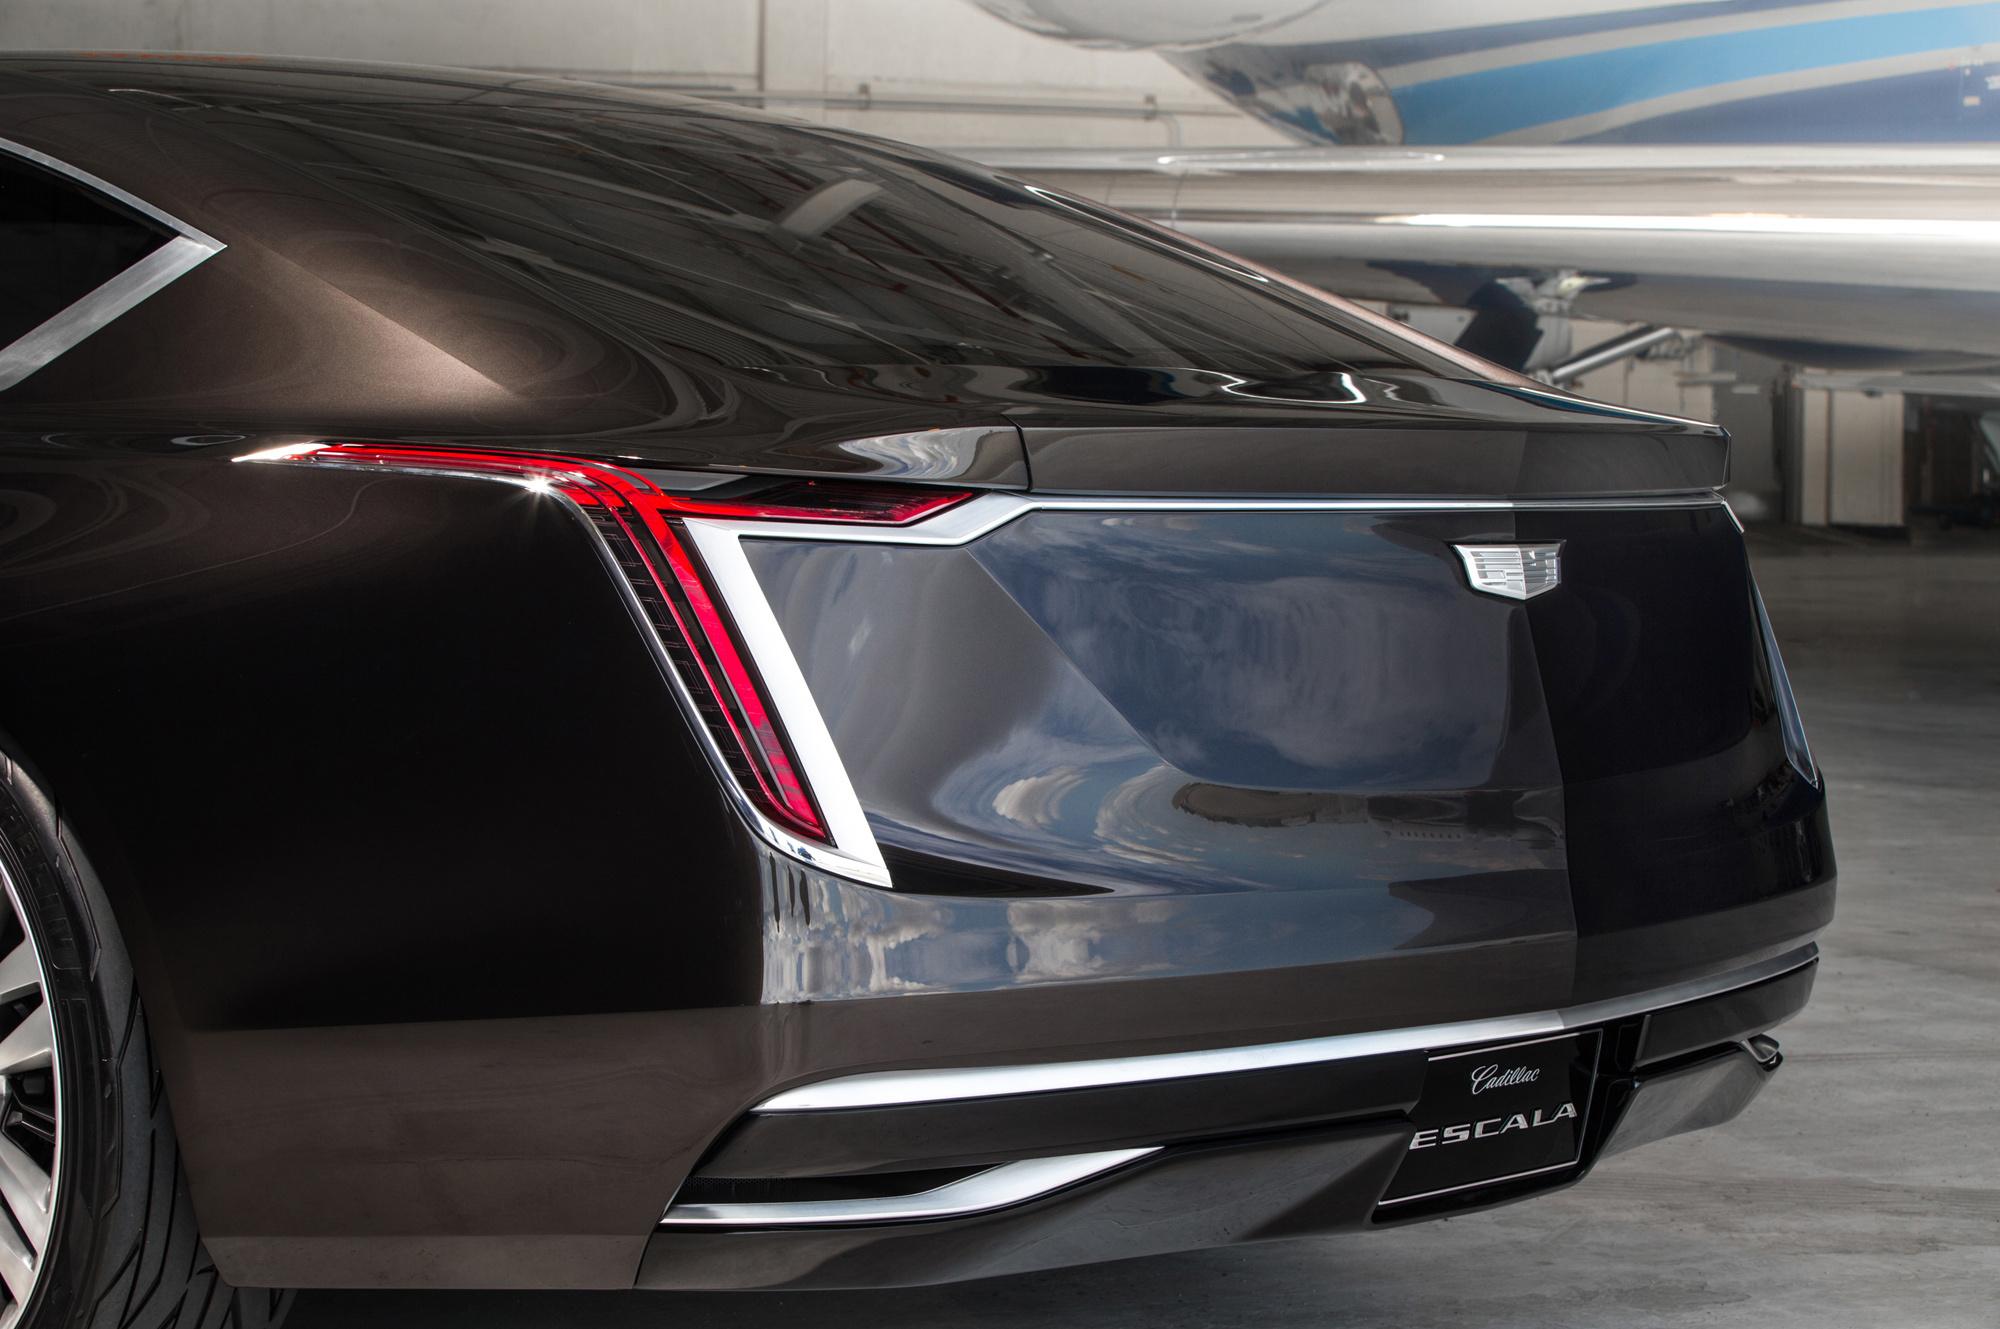 Cadillac Escala High Quality Wallpapers